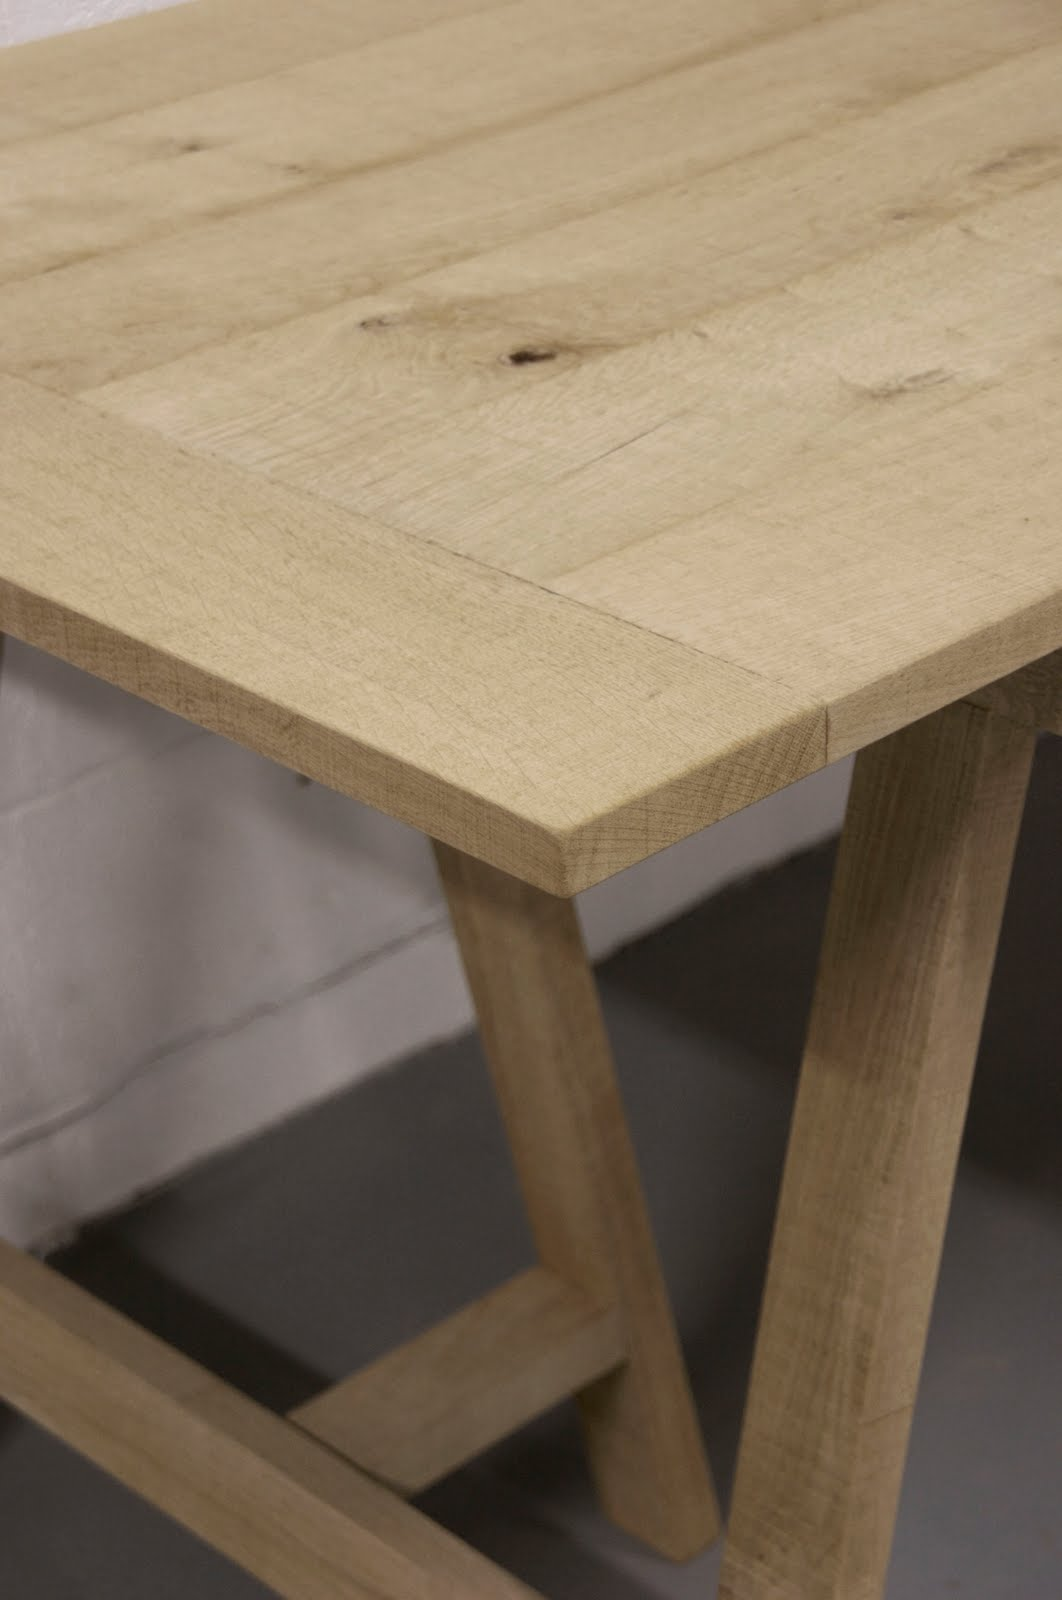 malvini belgium Louis Trestle Table : LOUIS2BTRESTE2BMALVINI2BSCHRAGENTAFEL2B2 from malvini.blogspot.com size 1062 x 1600 jpeg 78kB